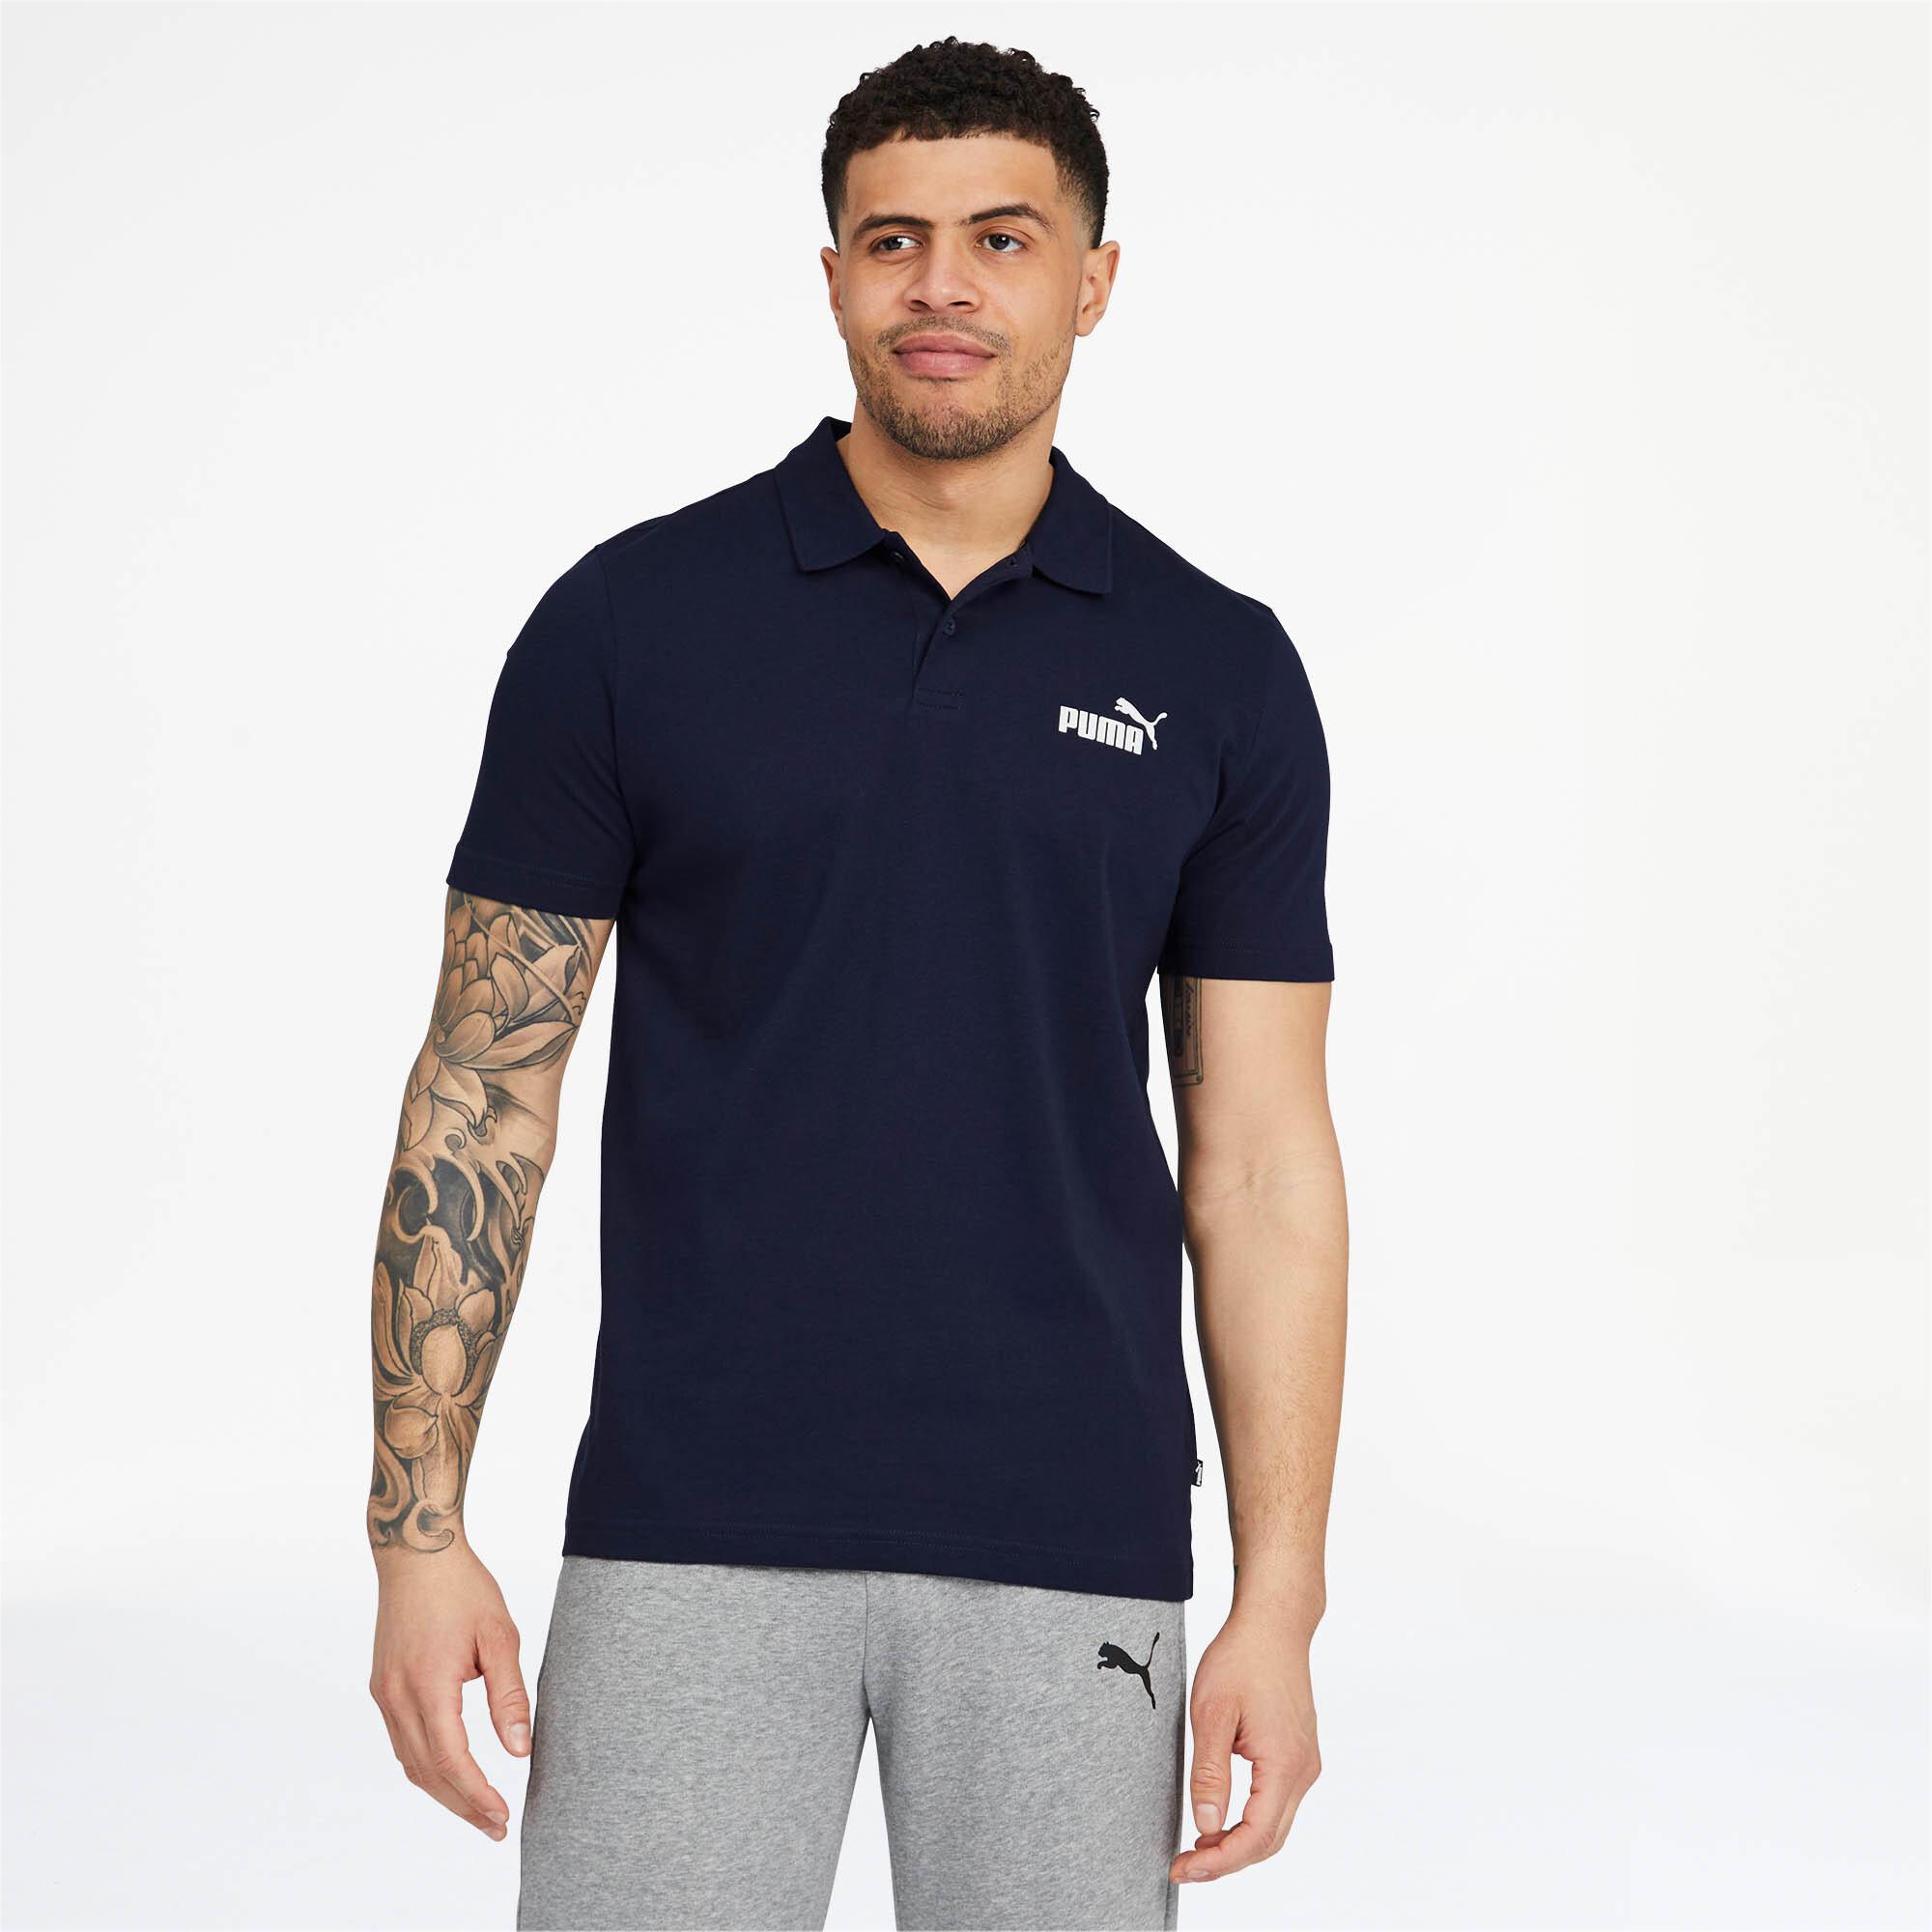 PUMA-Essentials-Men-039-s-Jersey-Polo-Men-Polo-Basics thumbnail 11